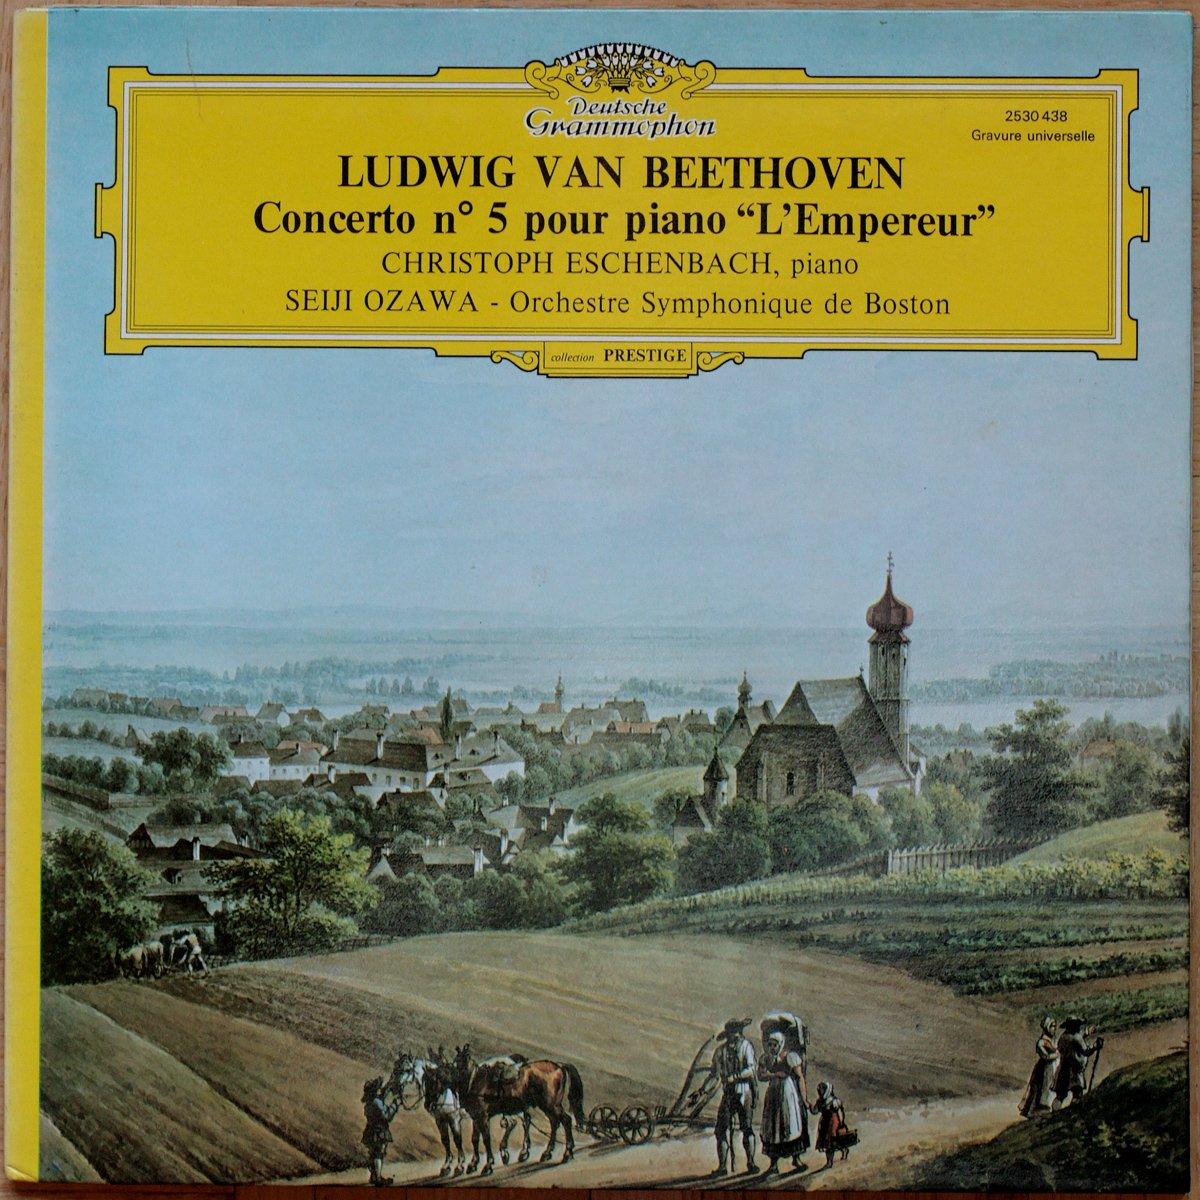 "Beethoven • Concerto pour piano n° 5 ""L'empereur"" • DGG 2530 438 • Christoph Eschenbach • Boston Symphony Orchestra • Seiji Ozawa"